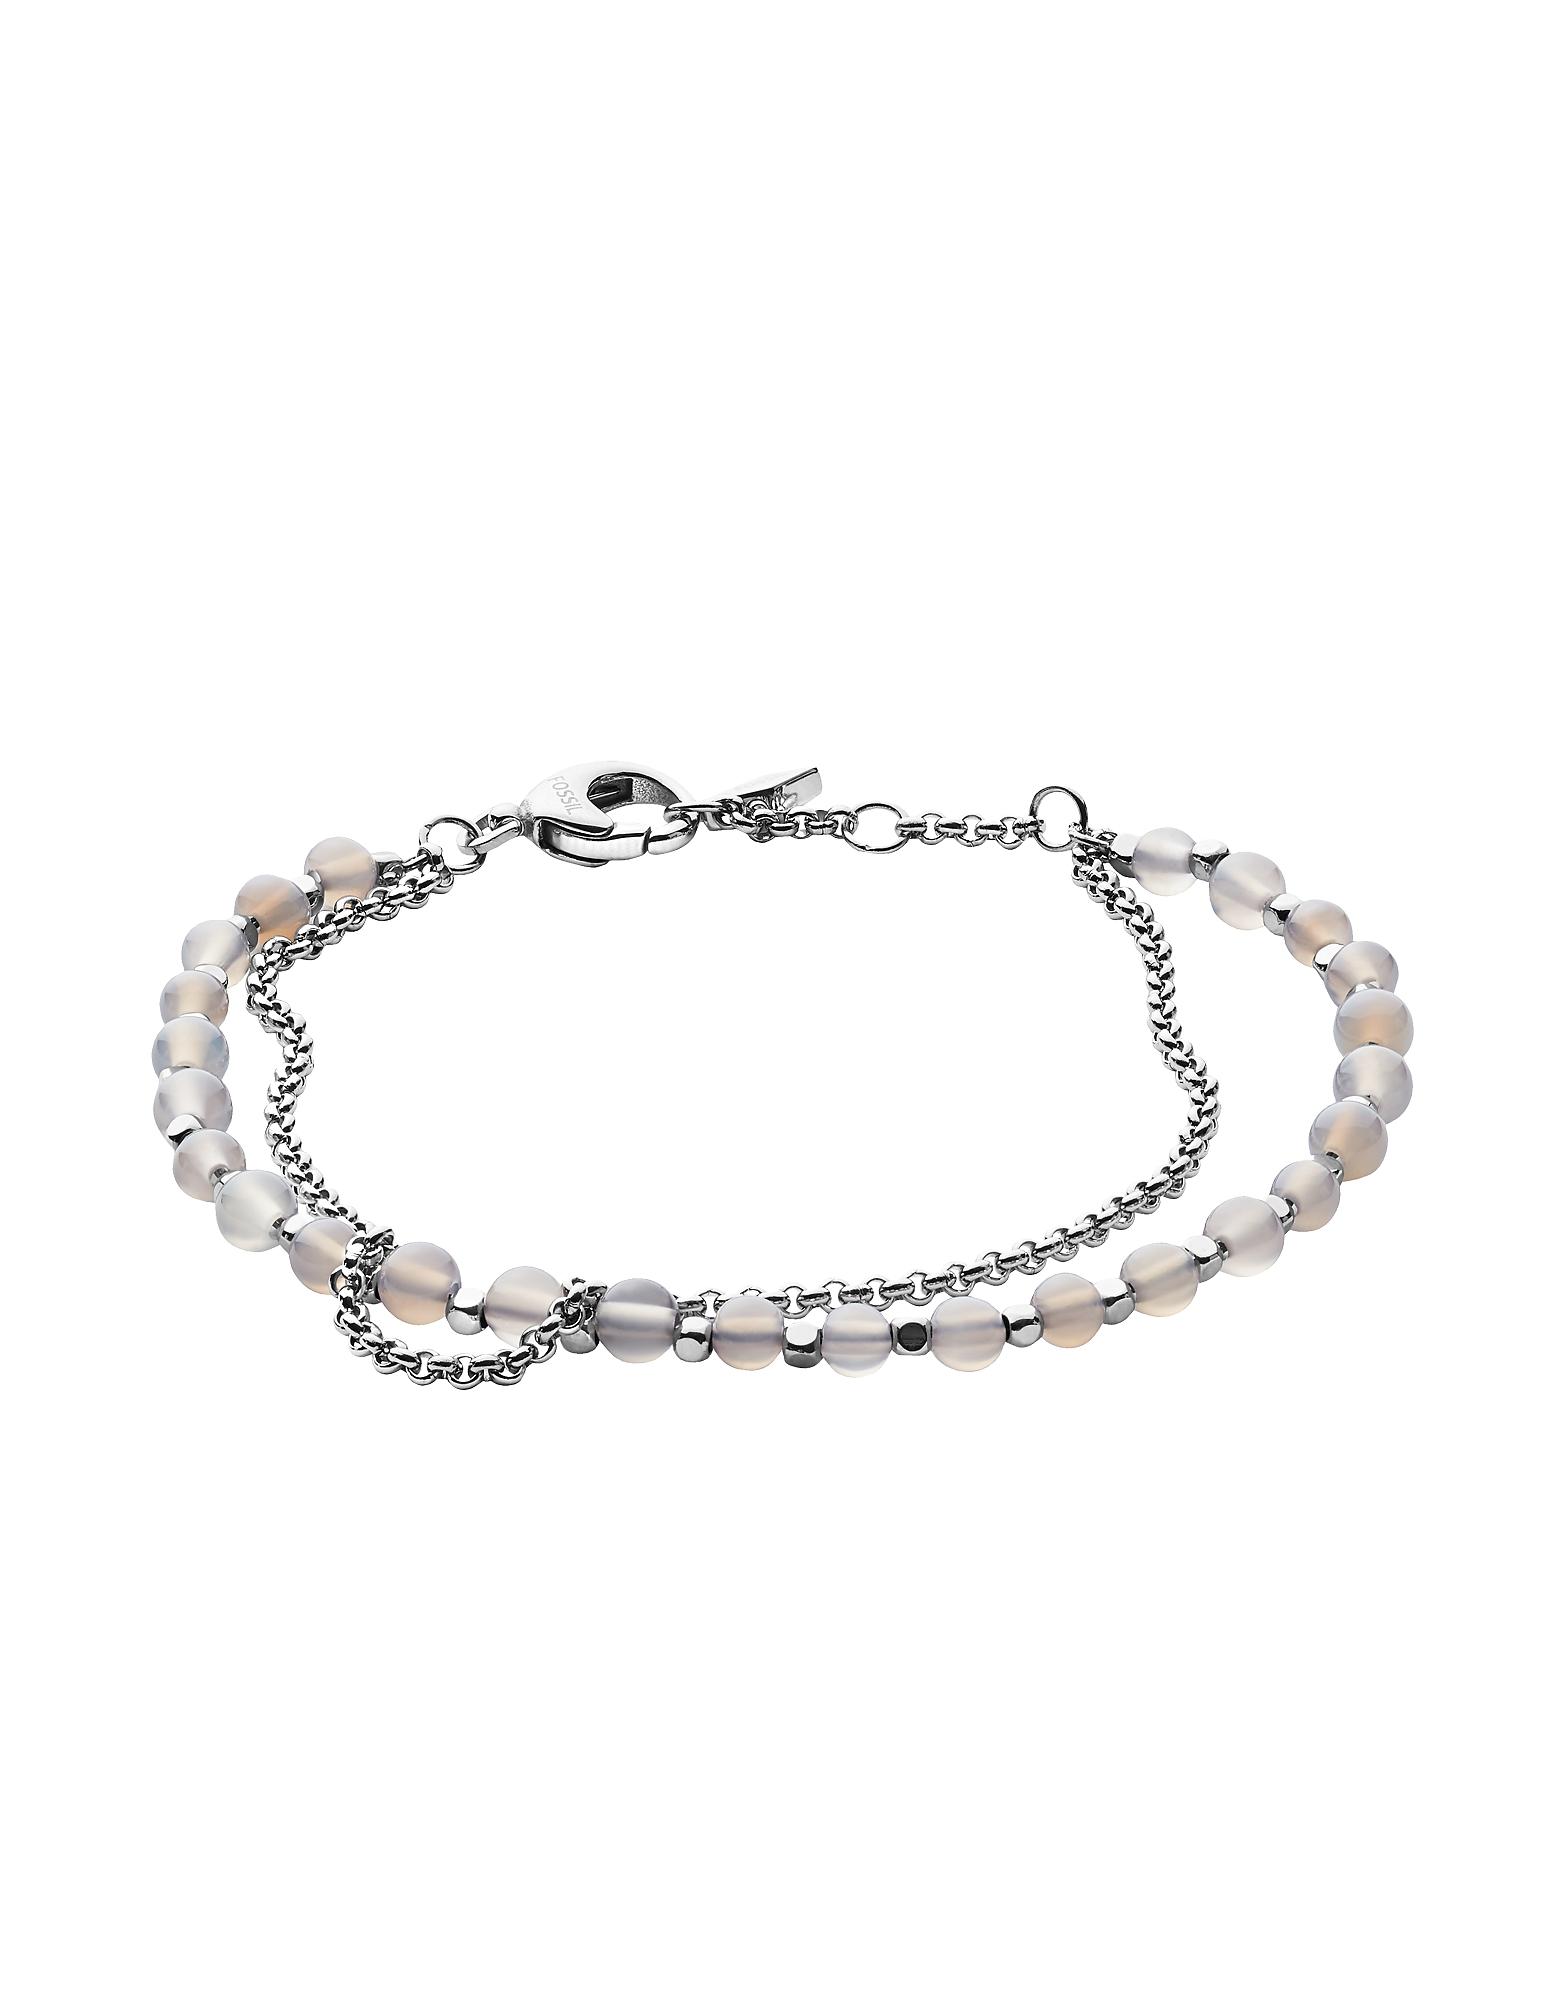 Silver Semi-Precious Double-Chain Women's Bracelet